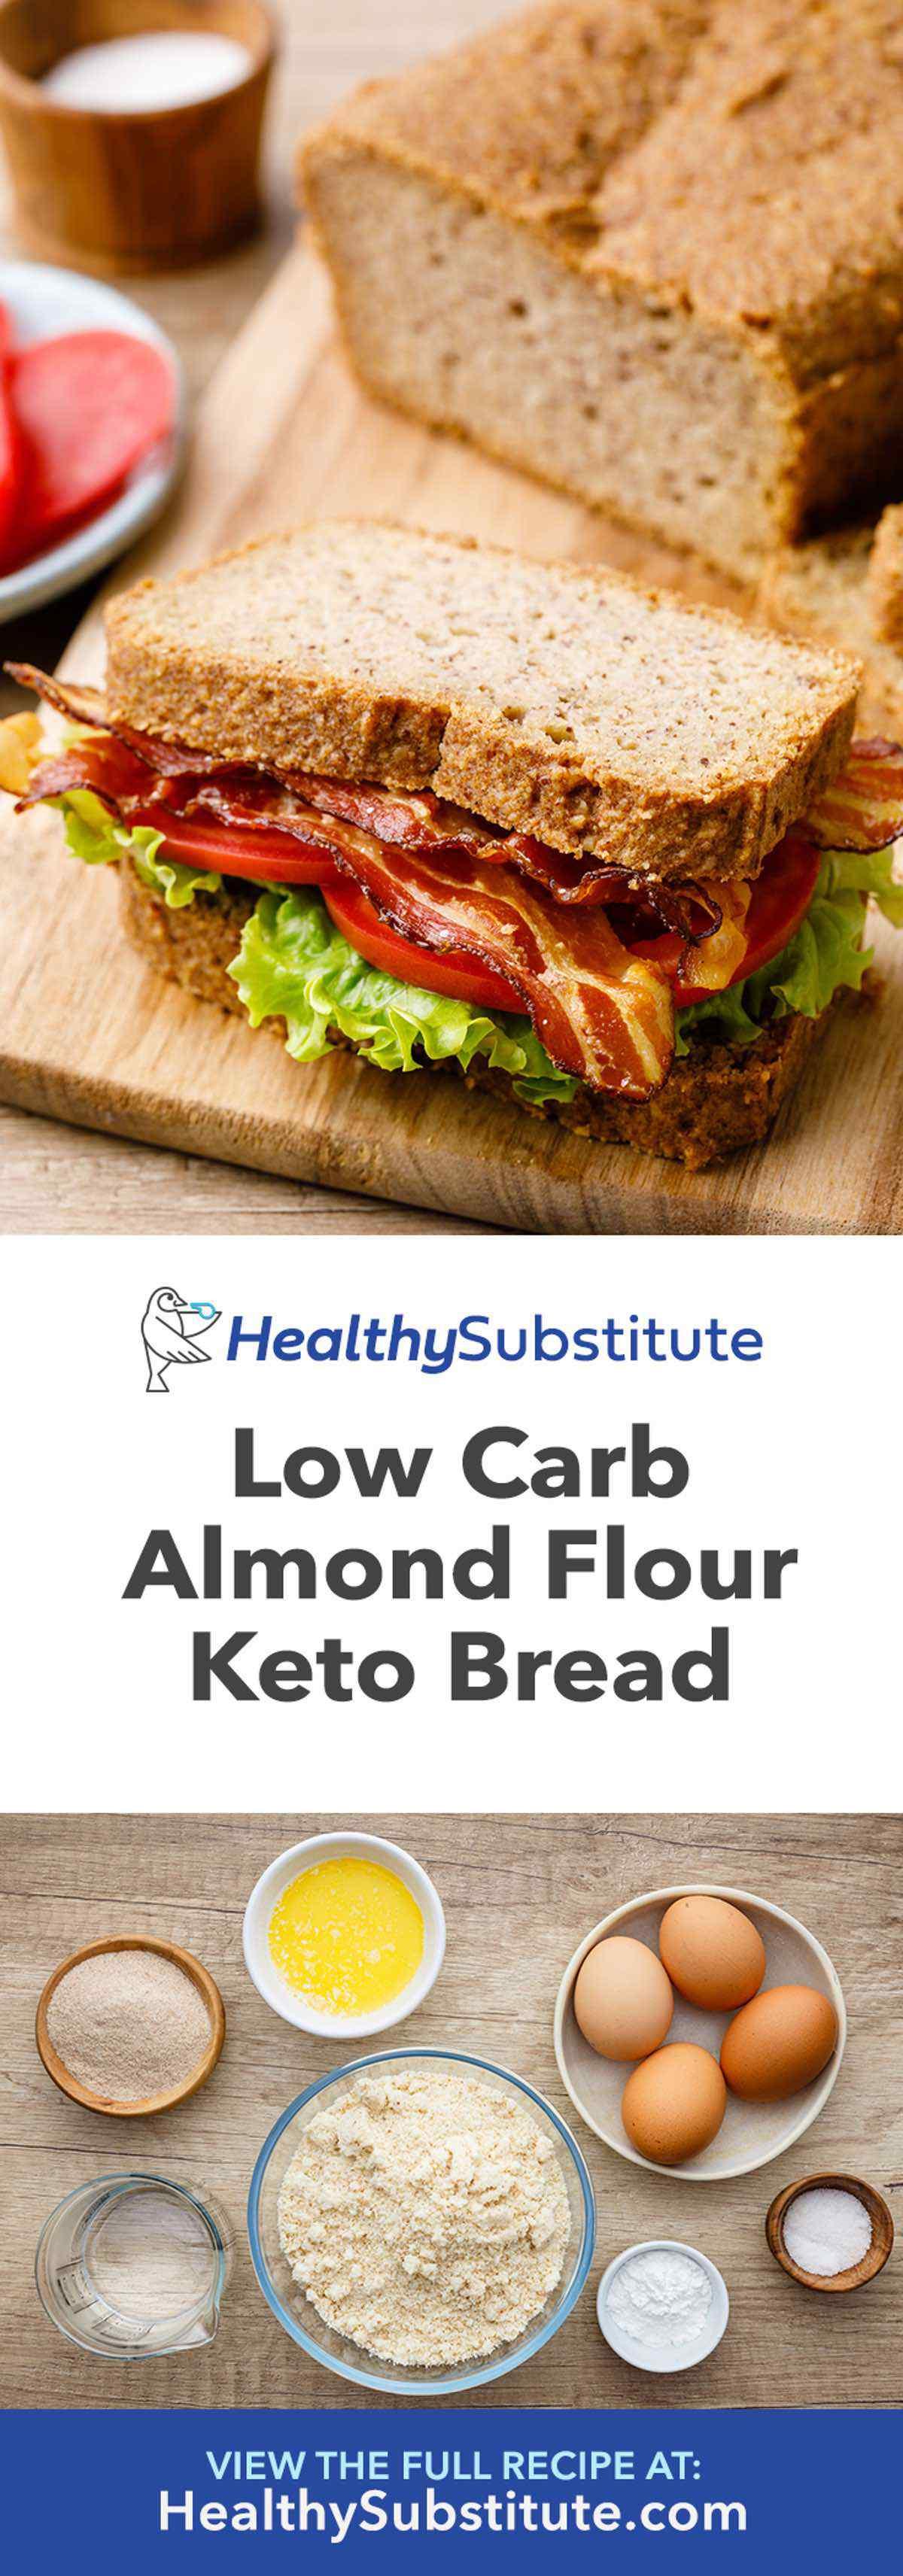 Low Carb Almond Flour Keto Bread Recipe